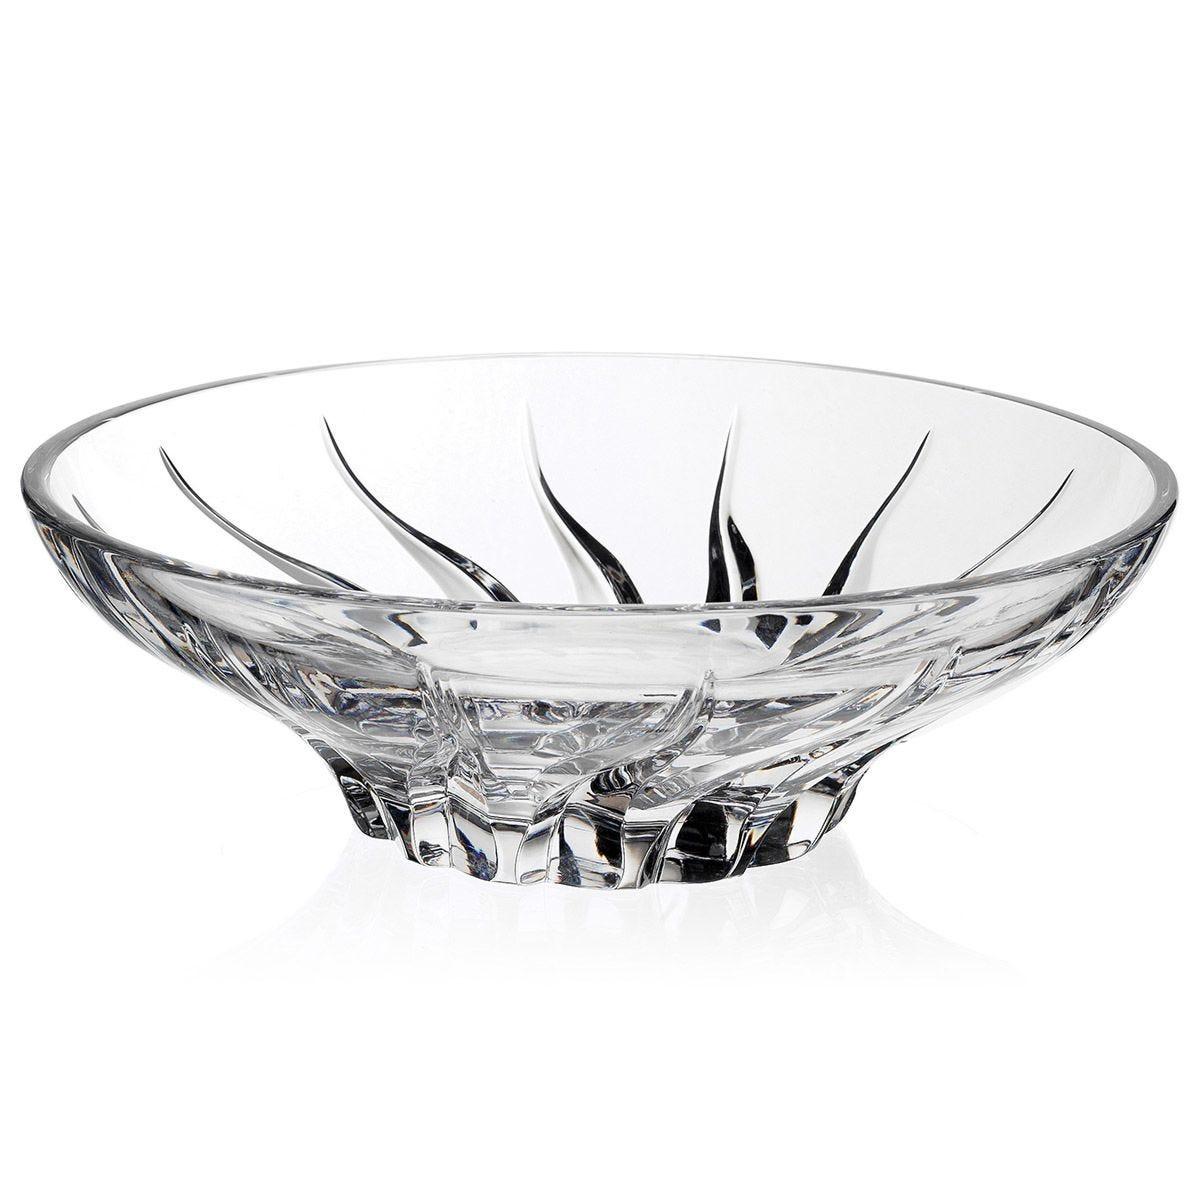 RCR Trix Italian Crystal Decorative Centrepiece Bowl